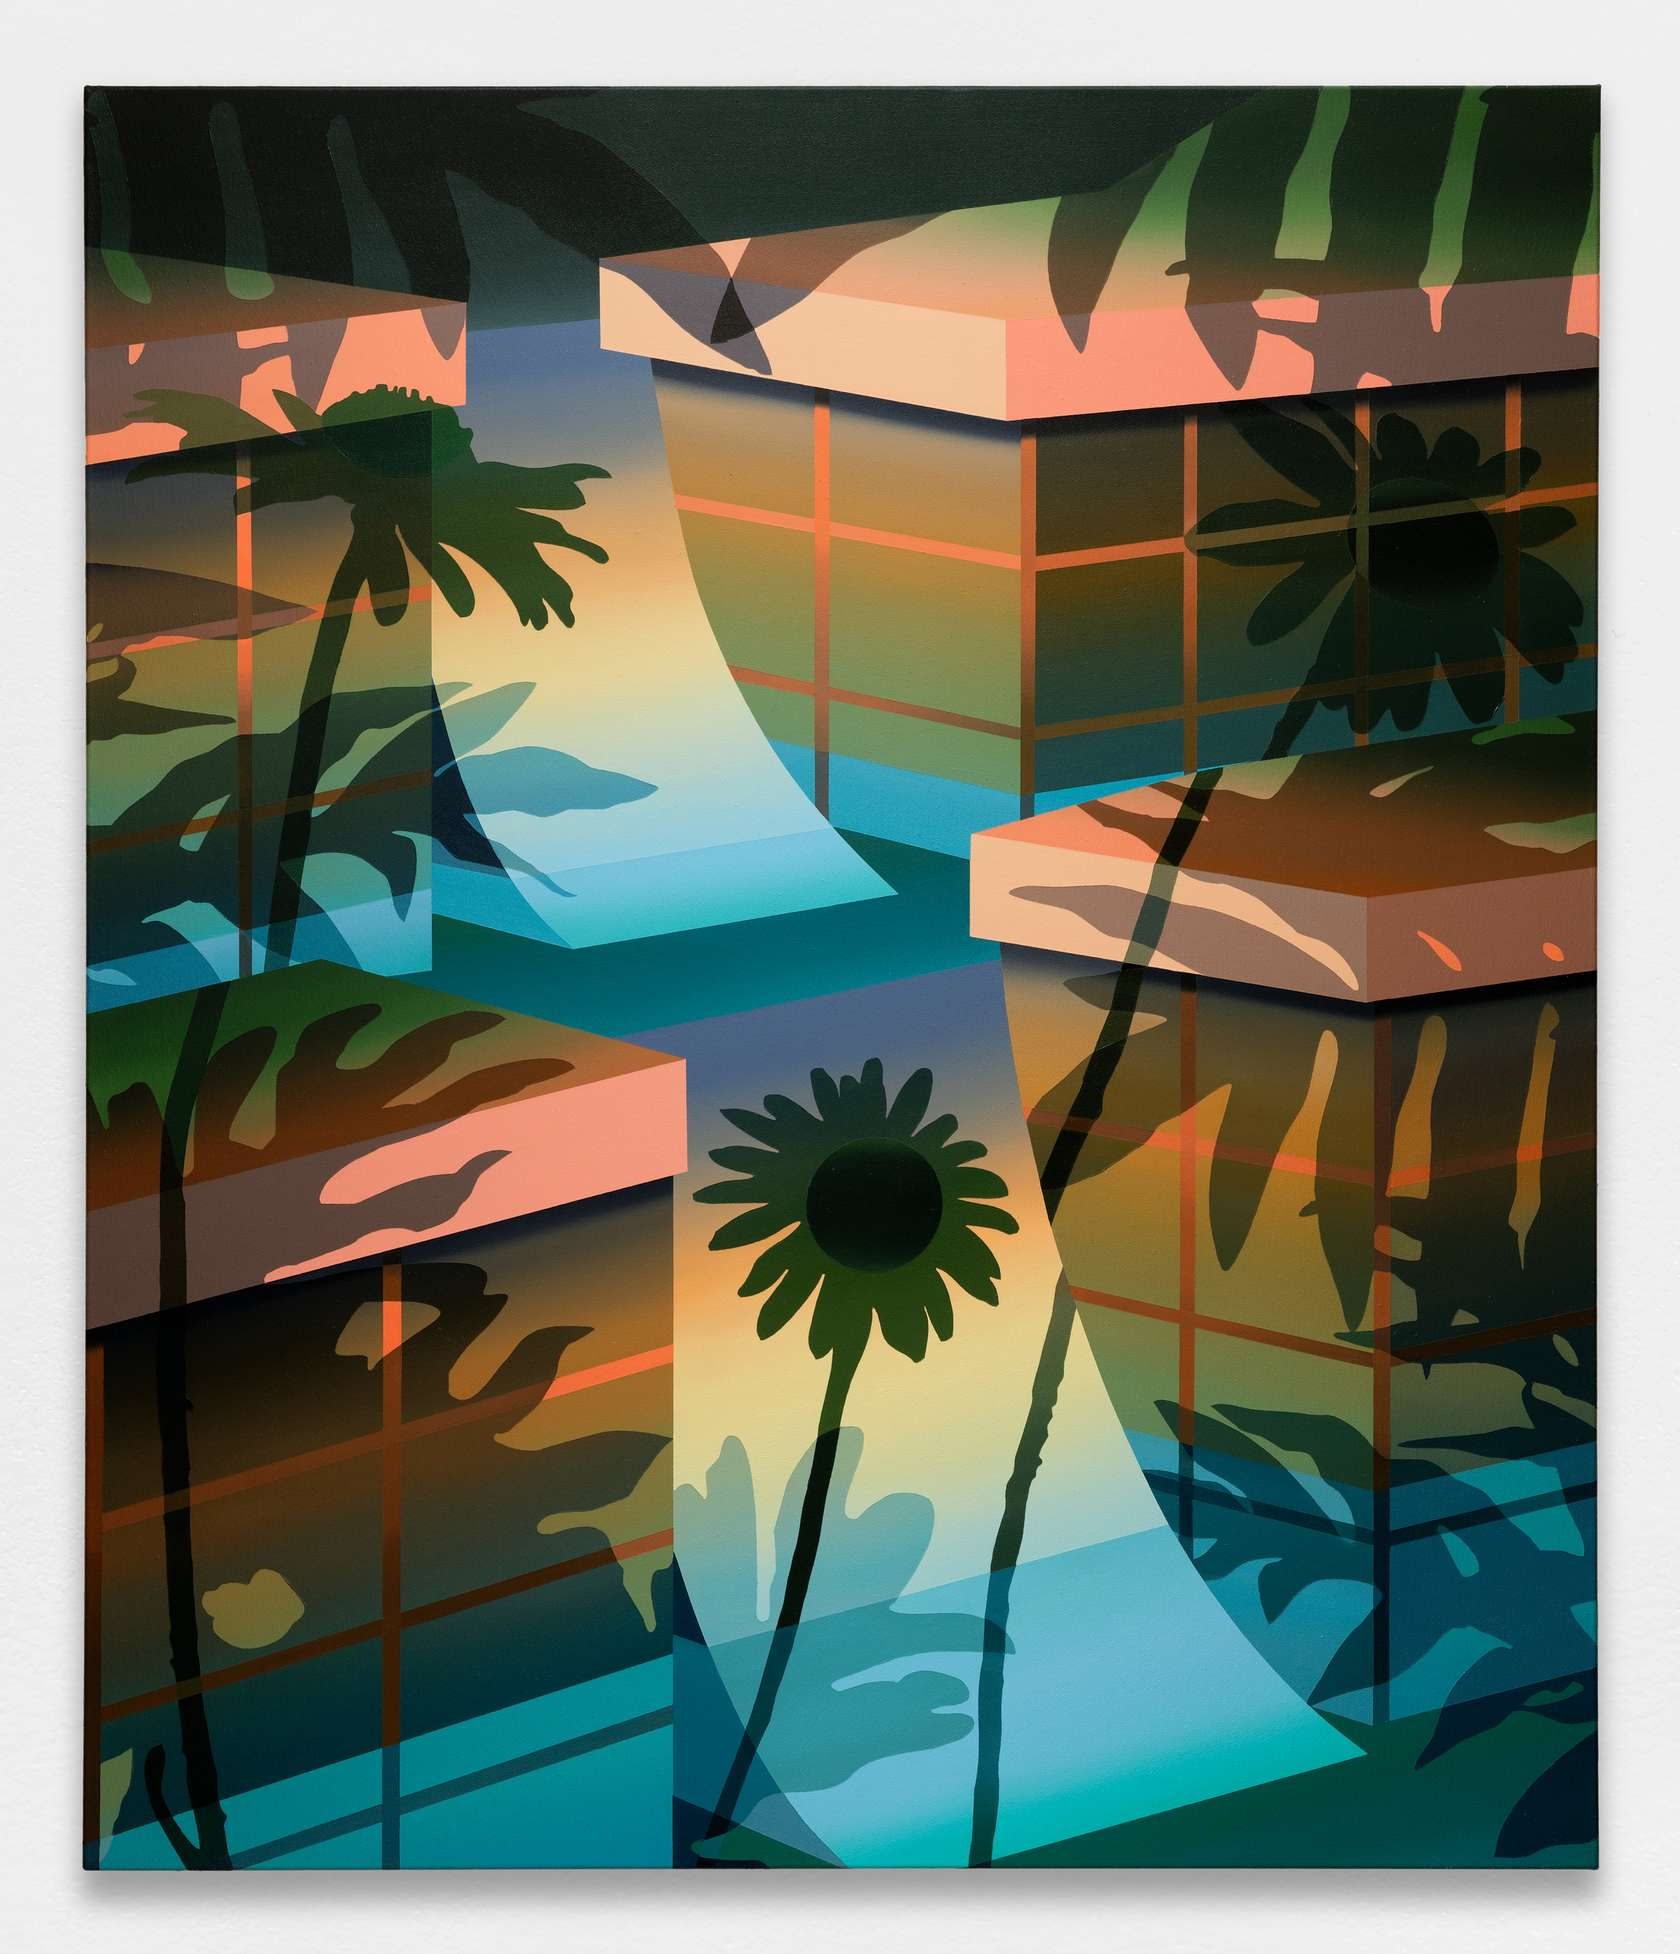 Amélie Bertrand, Man on the Moon Marigold, 2020 Huile sur toile100 × 85 cm / 39 3/8 × 33 1/2 in.